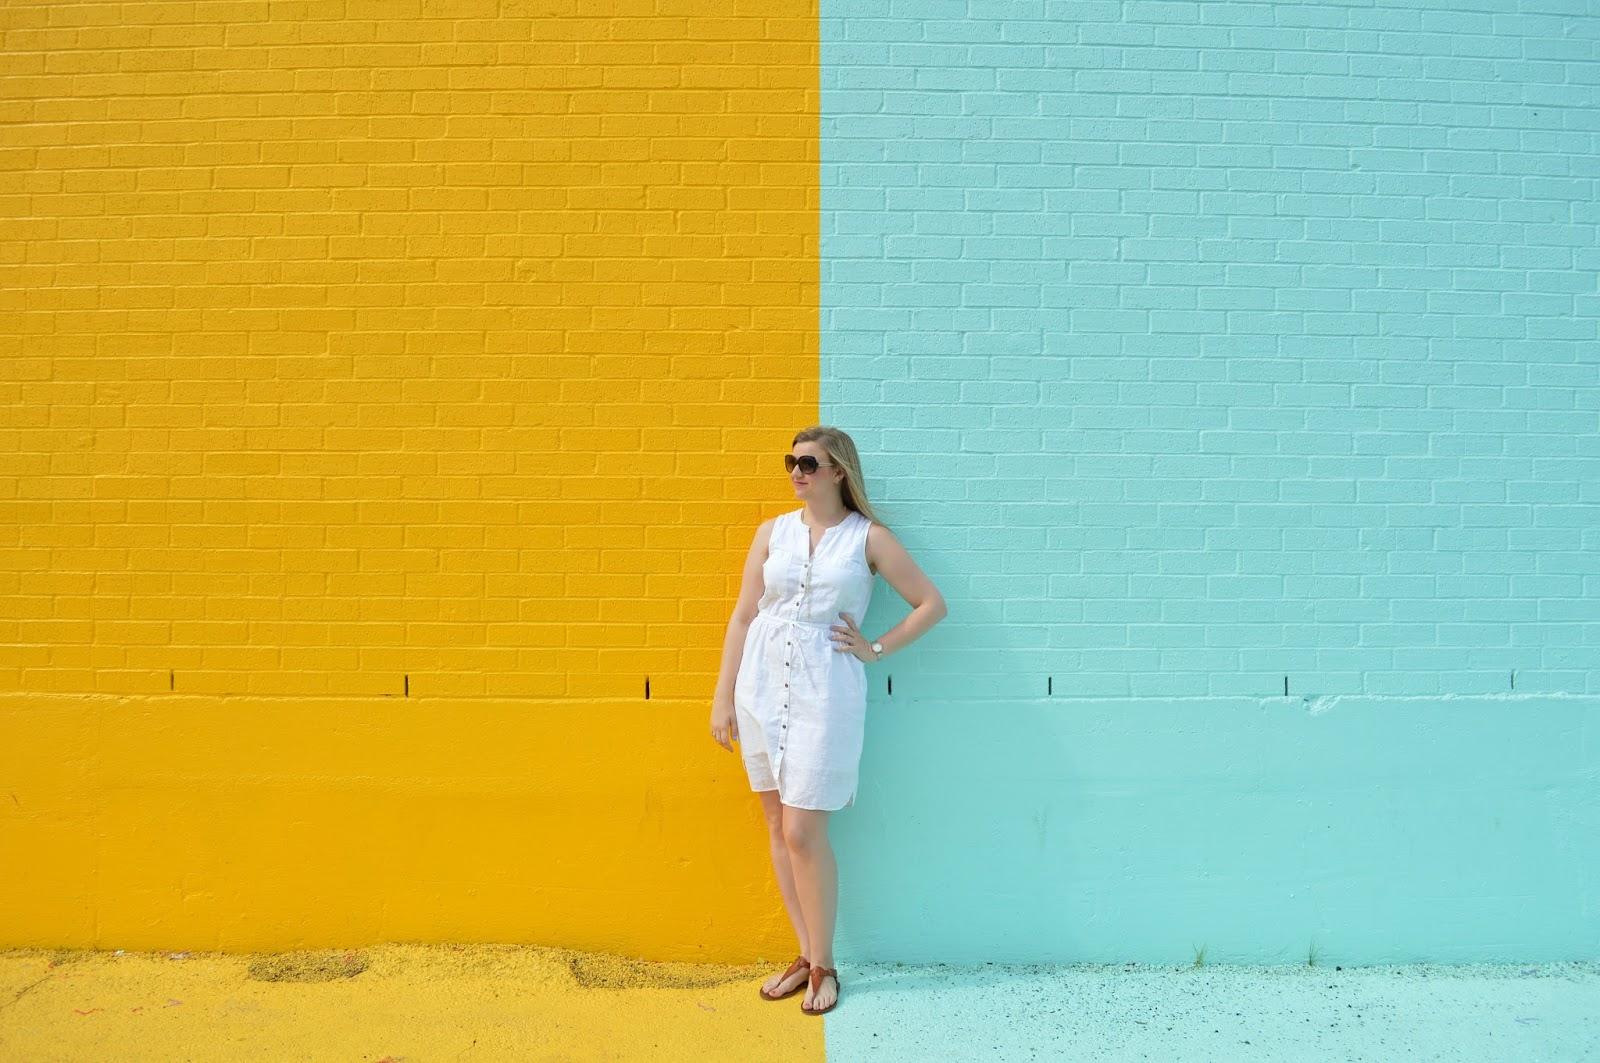 Exploring Houston: Sugar & Cloth Color Wall - Places I Will Go